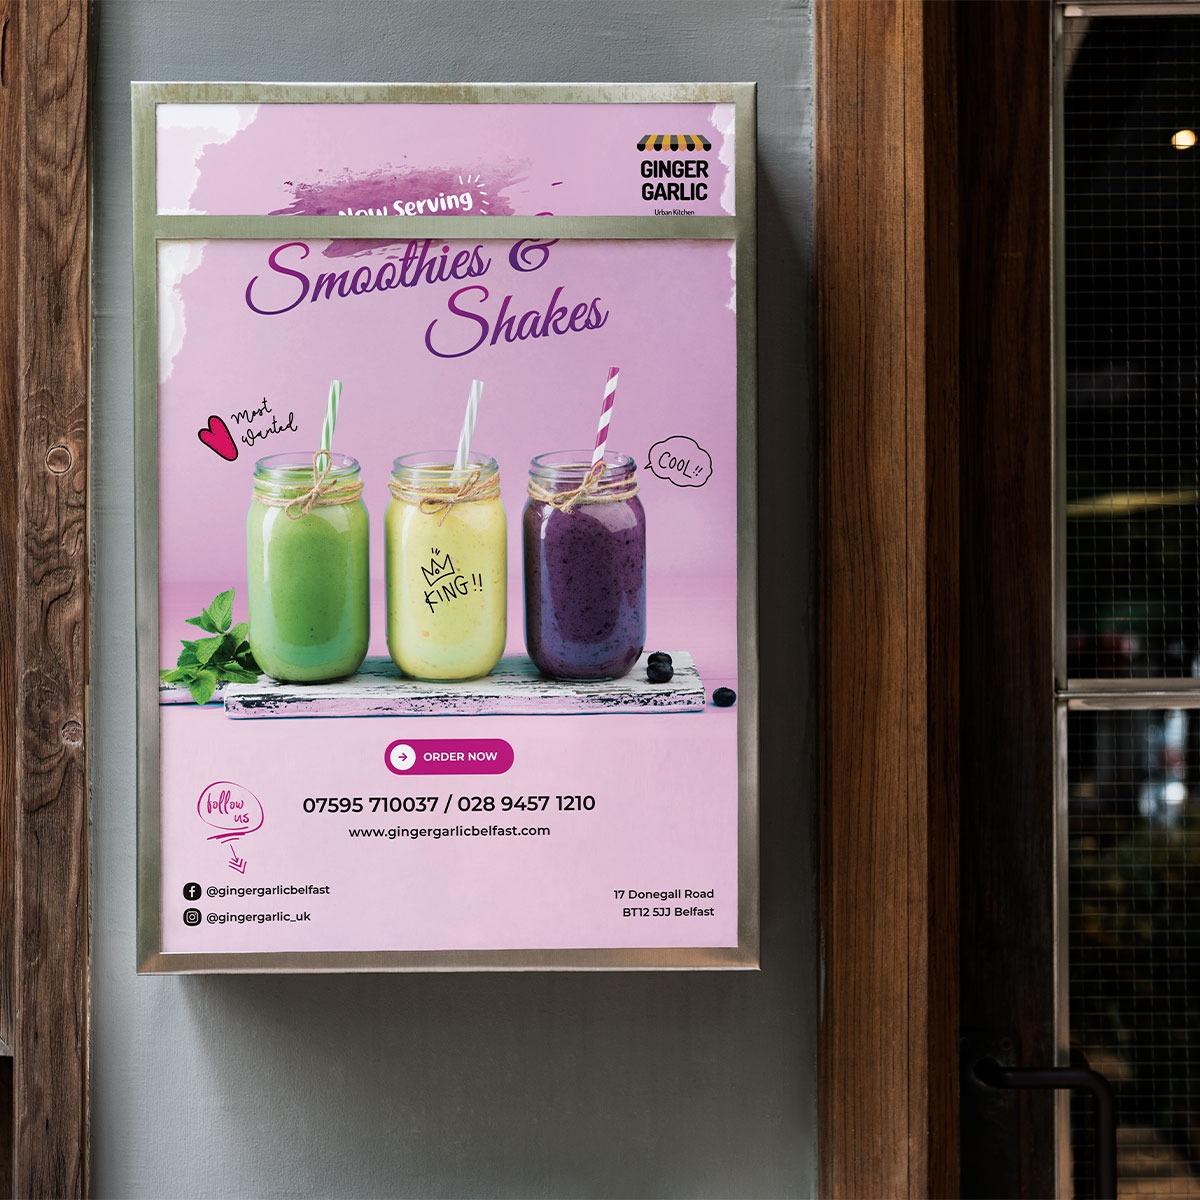 A3 Poster Design for Ginger Garlic Restaurant